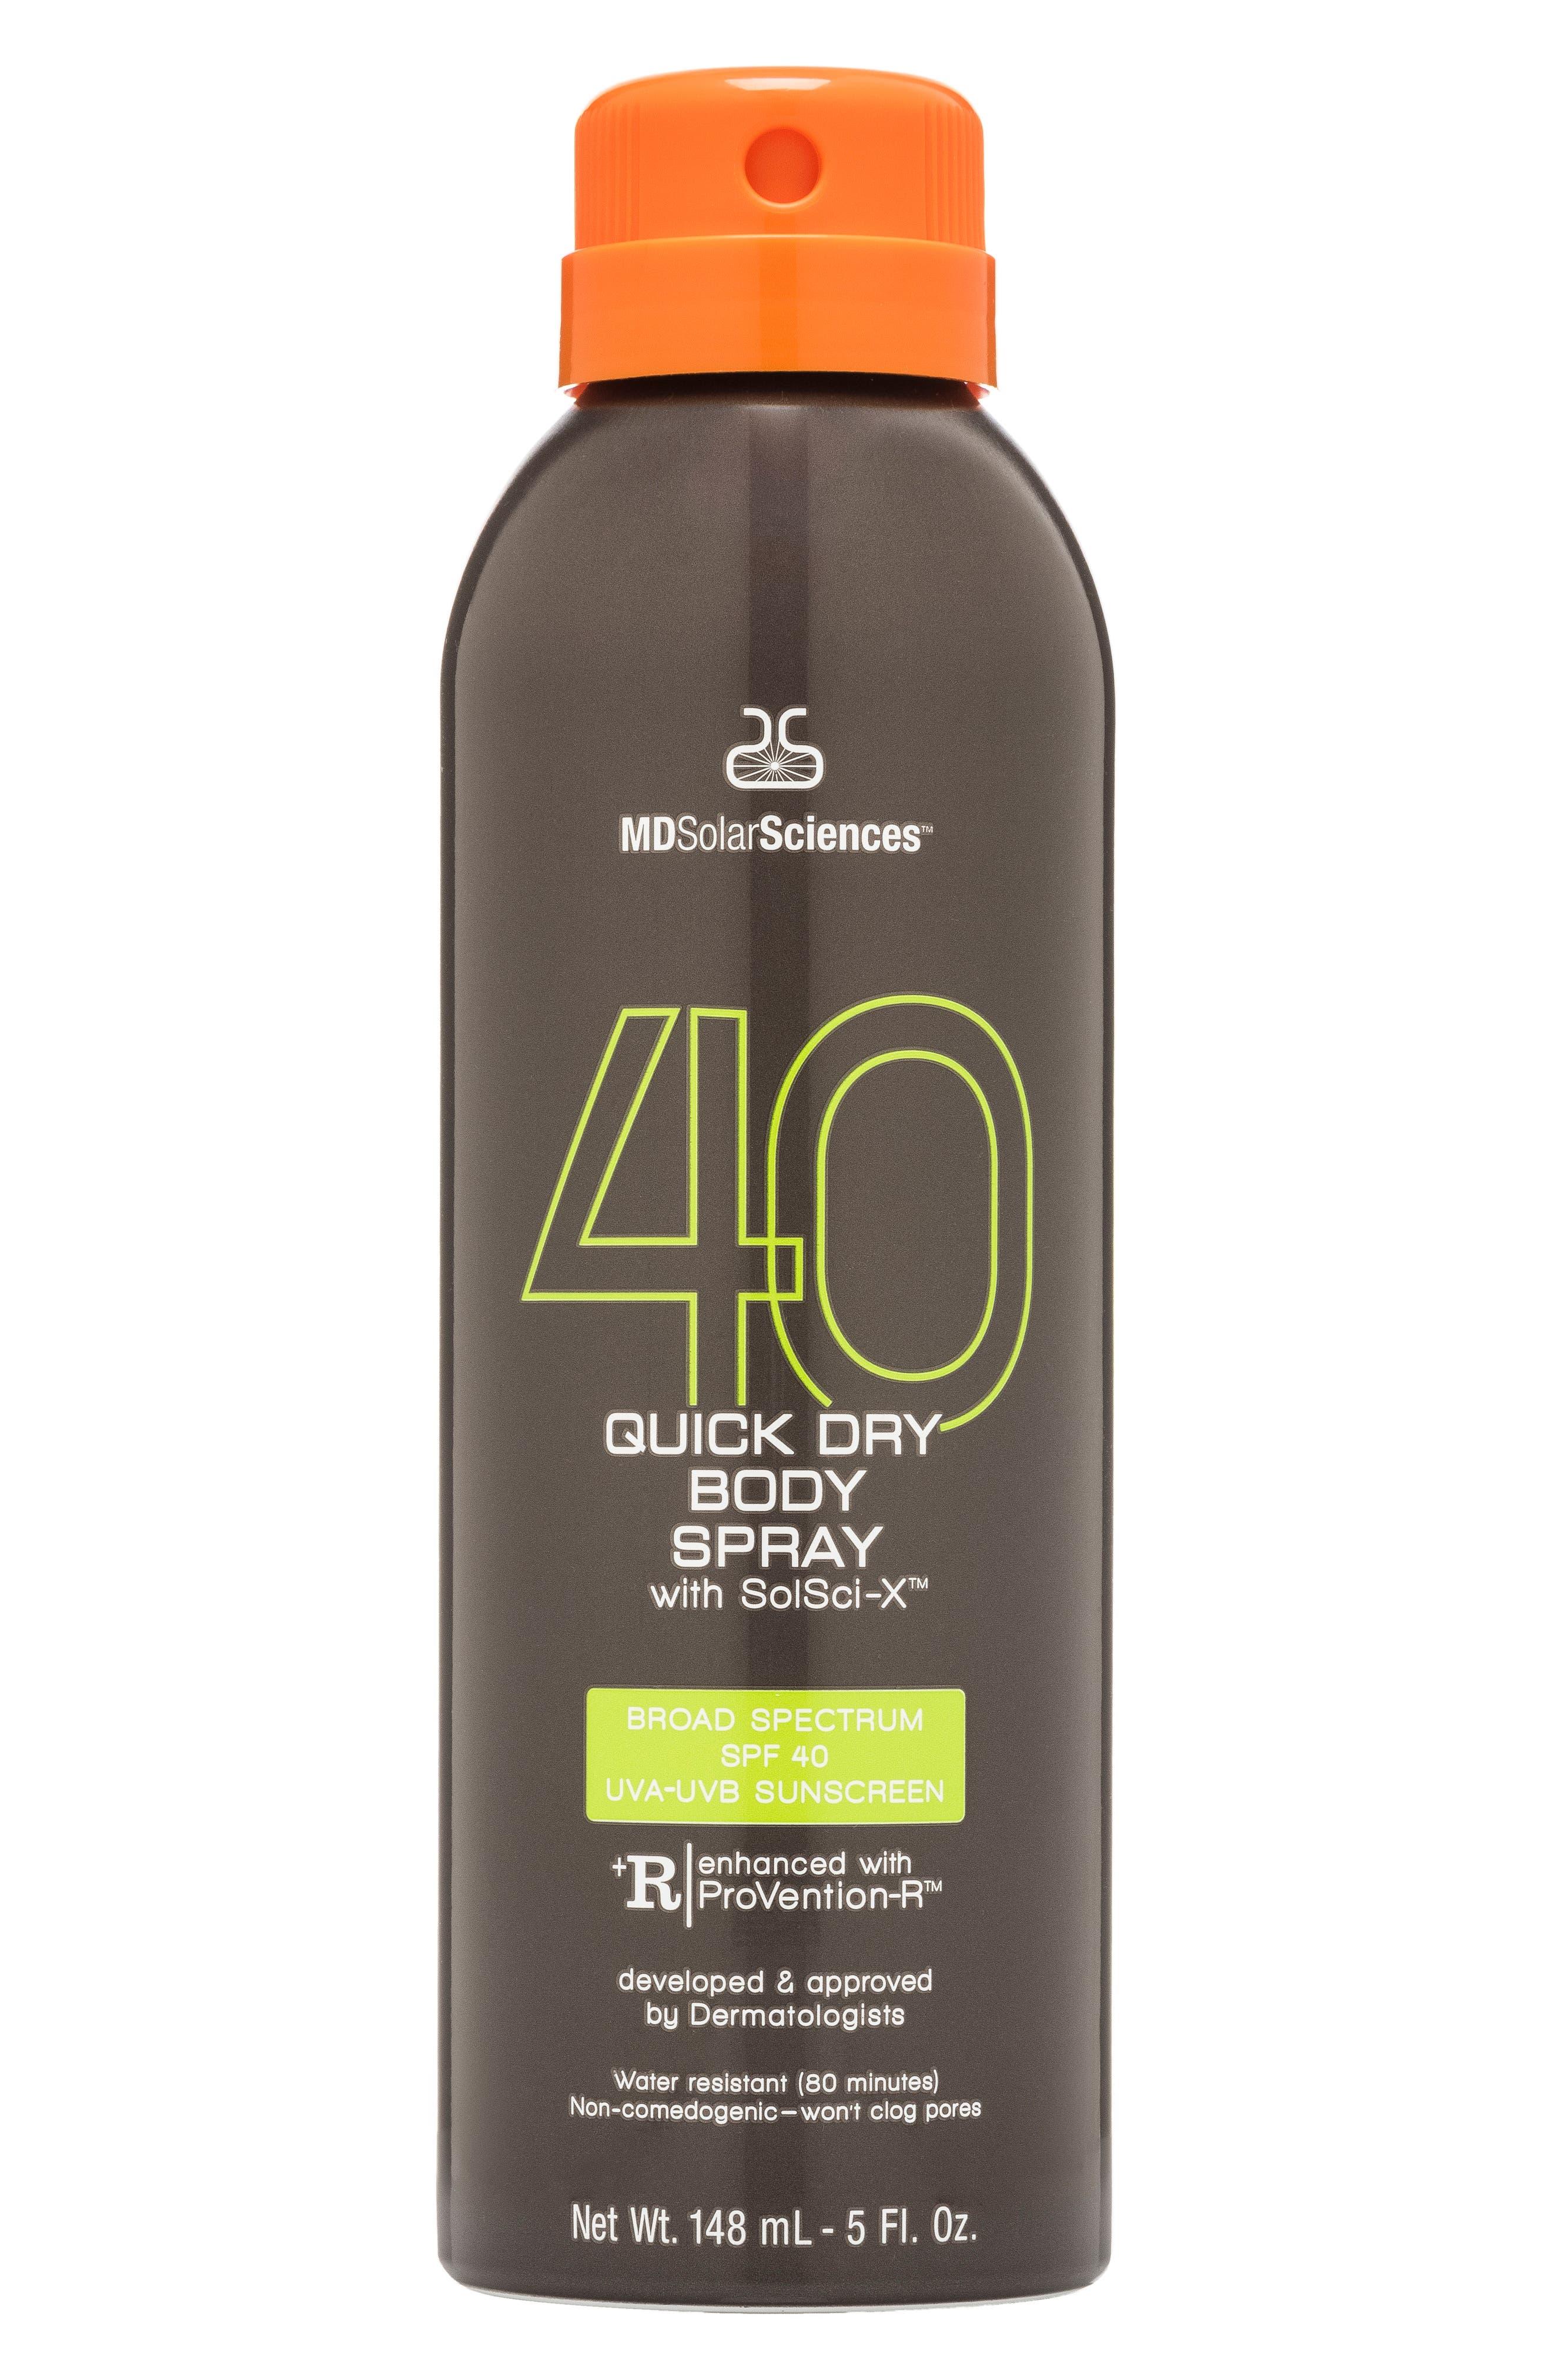 MDSolarSciences™ Quick Dry Body Spray Broad Spectrum SPF 40 Sunscreen